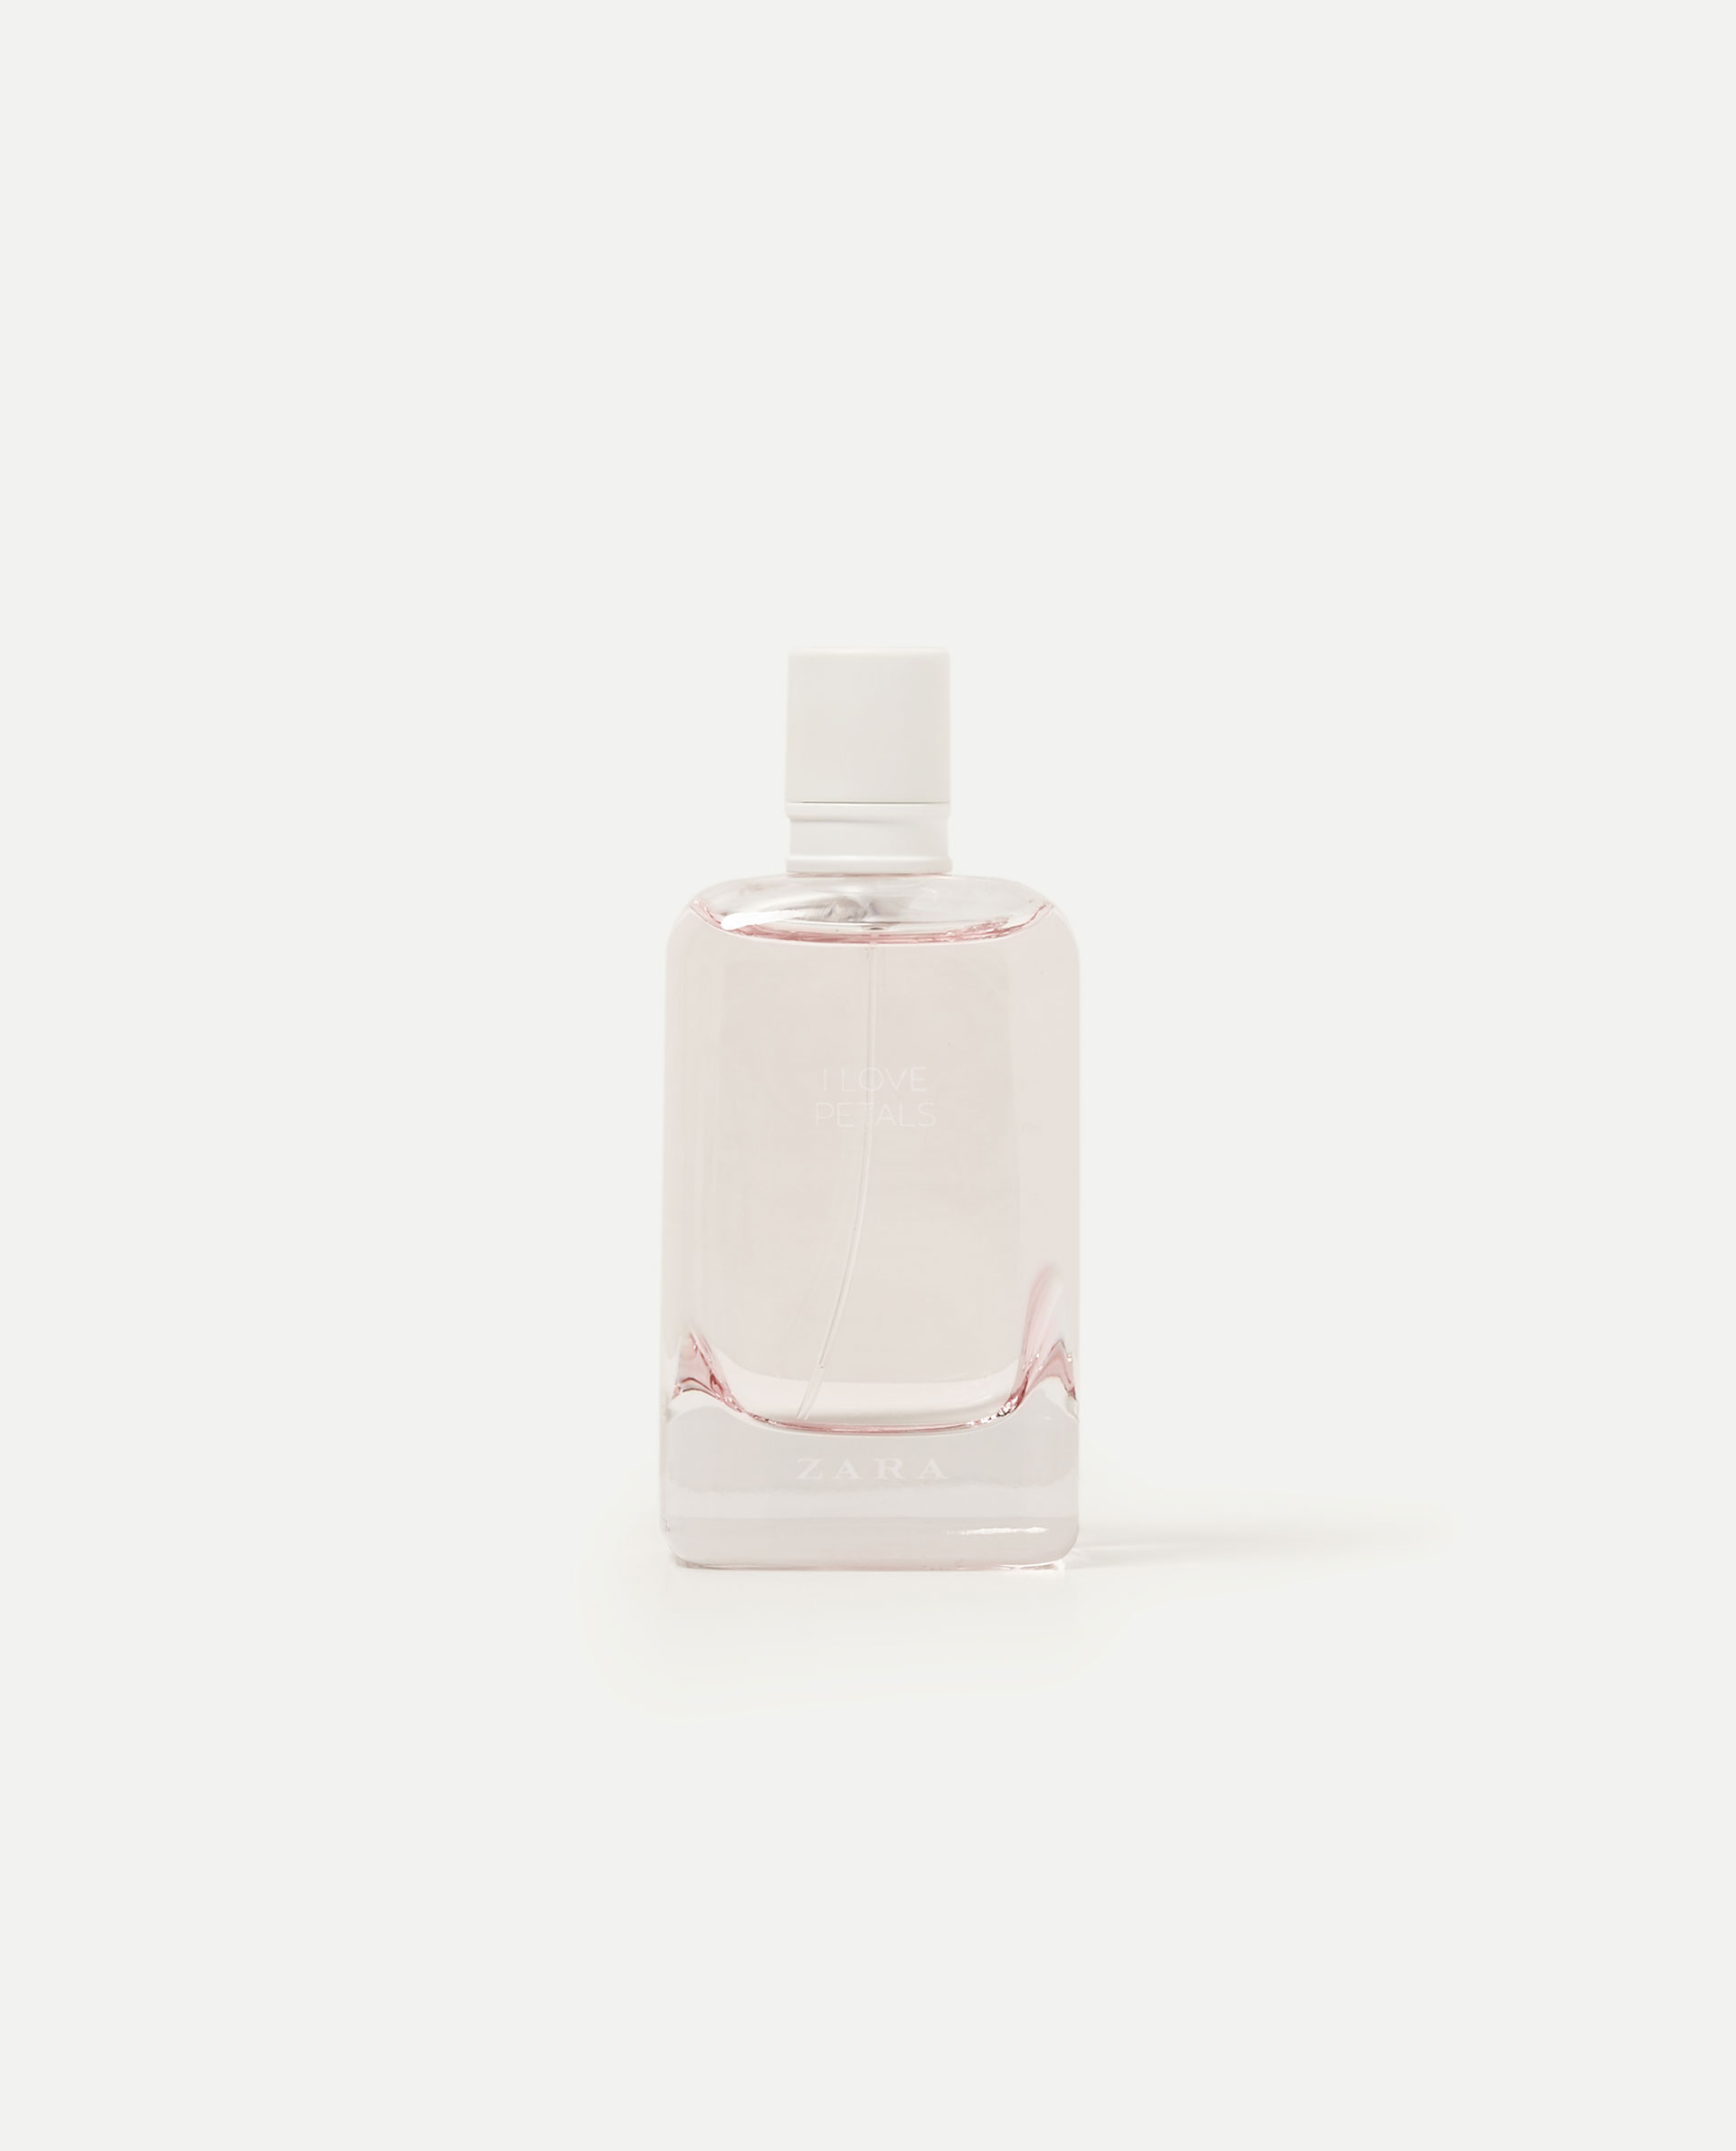 I Love Petals Zara Perfume A New Fragrance For Women 2017